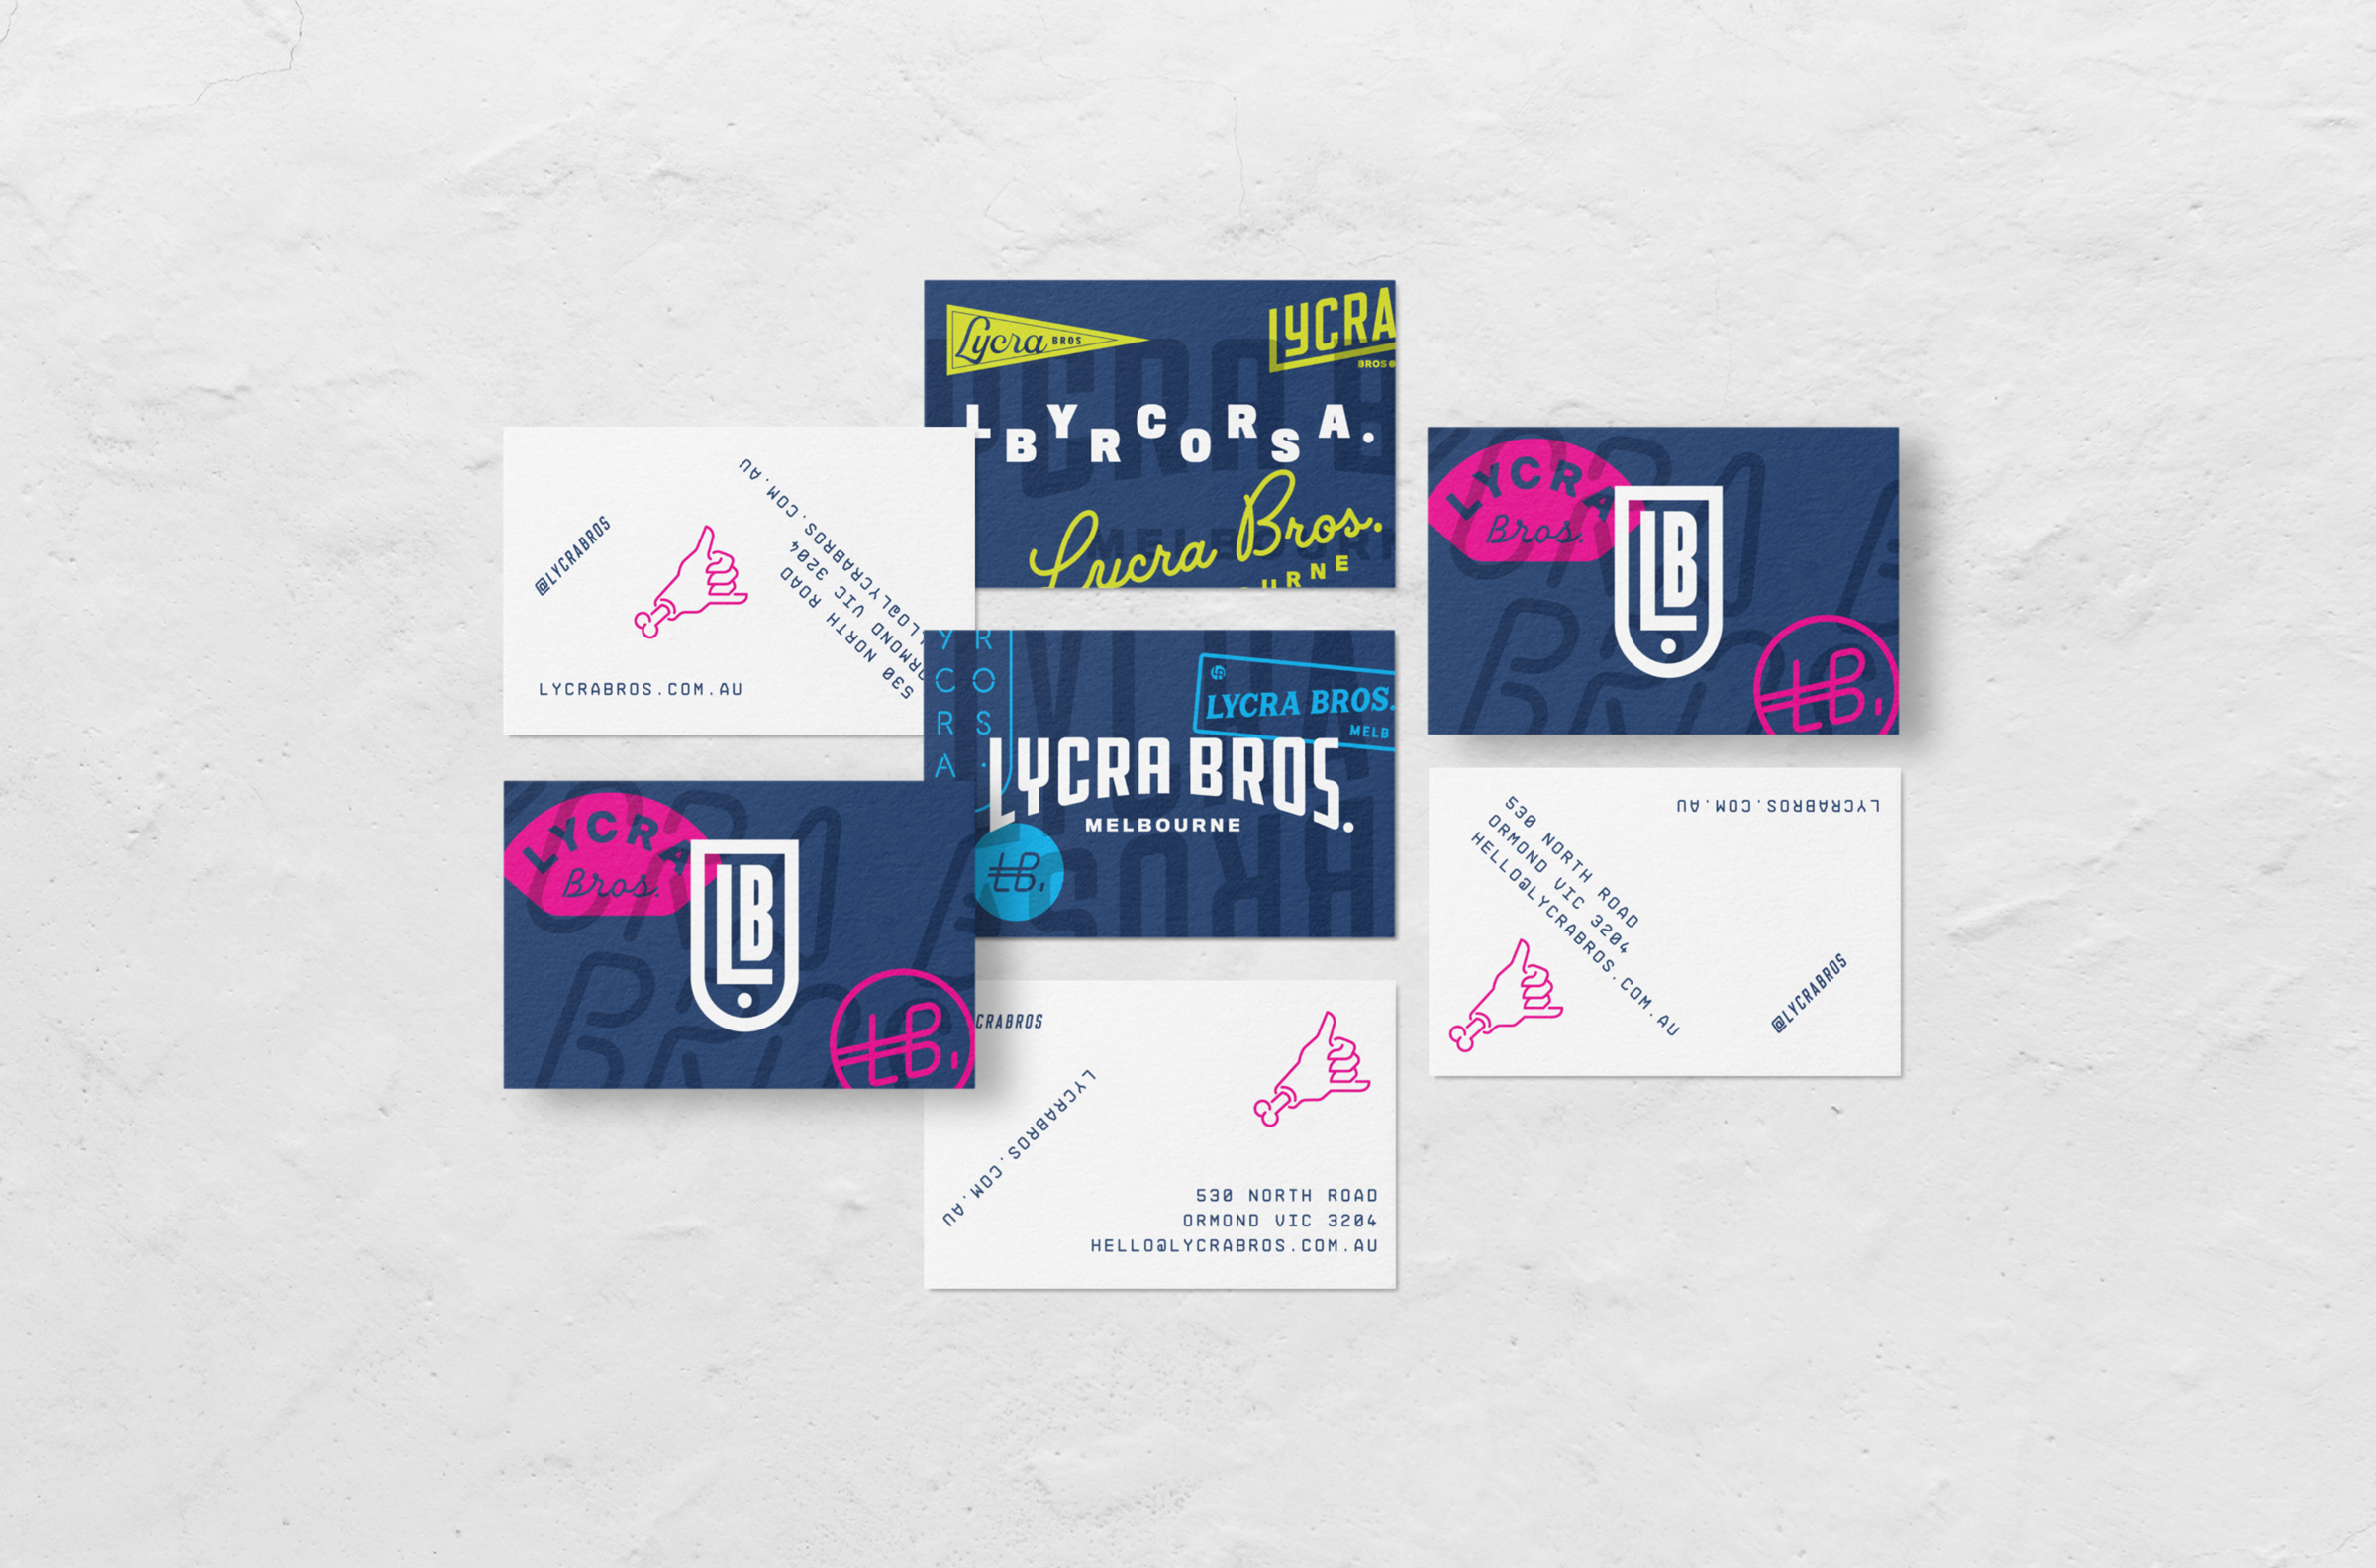 Lycra Bros. business cards